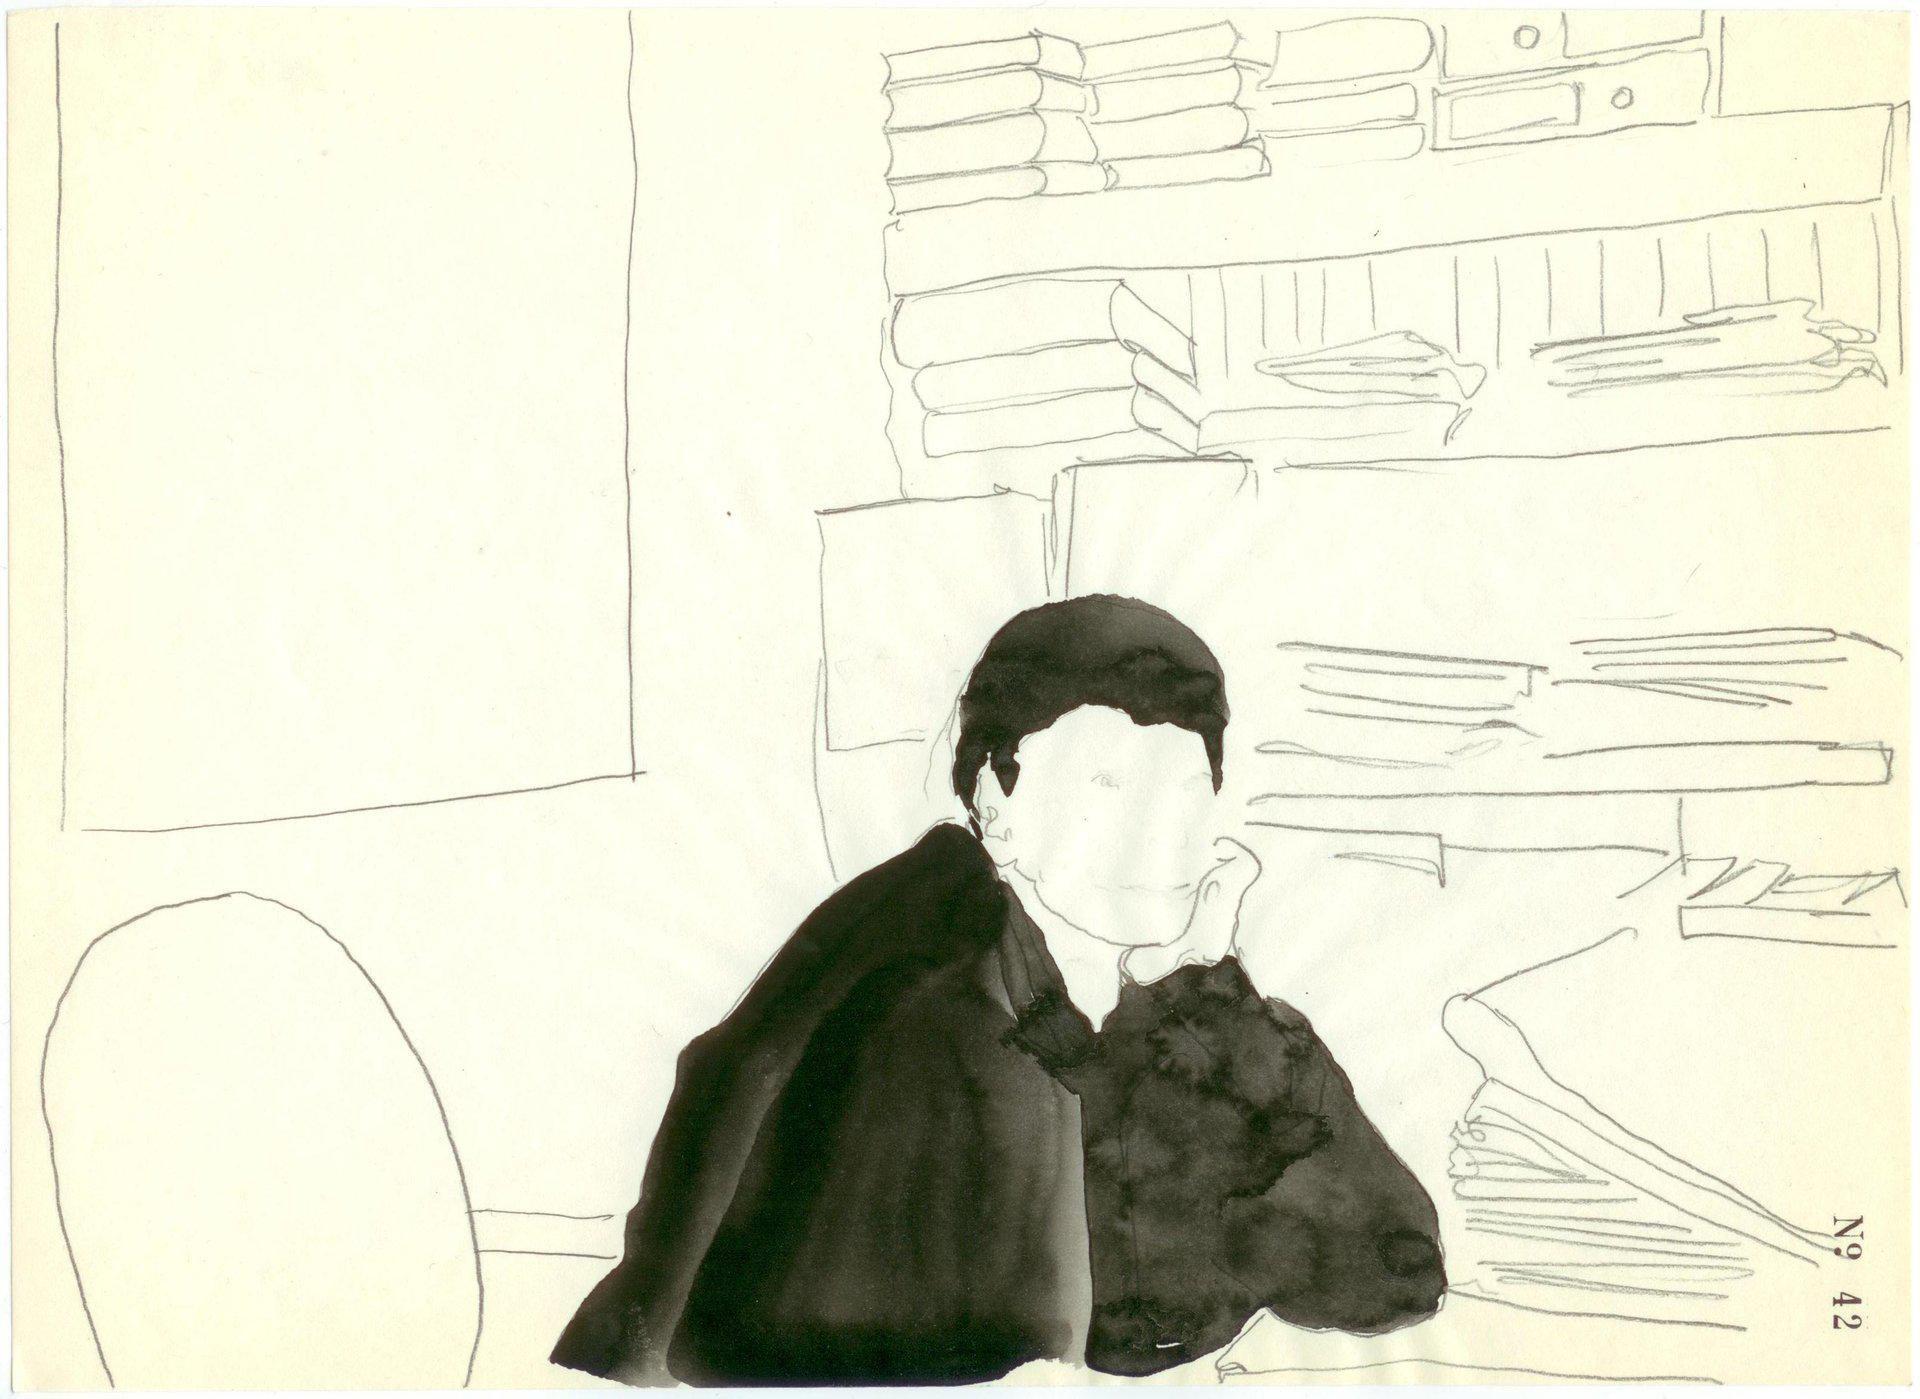 Yane Calovski, Obsessive Setting (Drawings), 2010, (11/12)